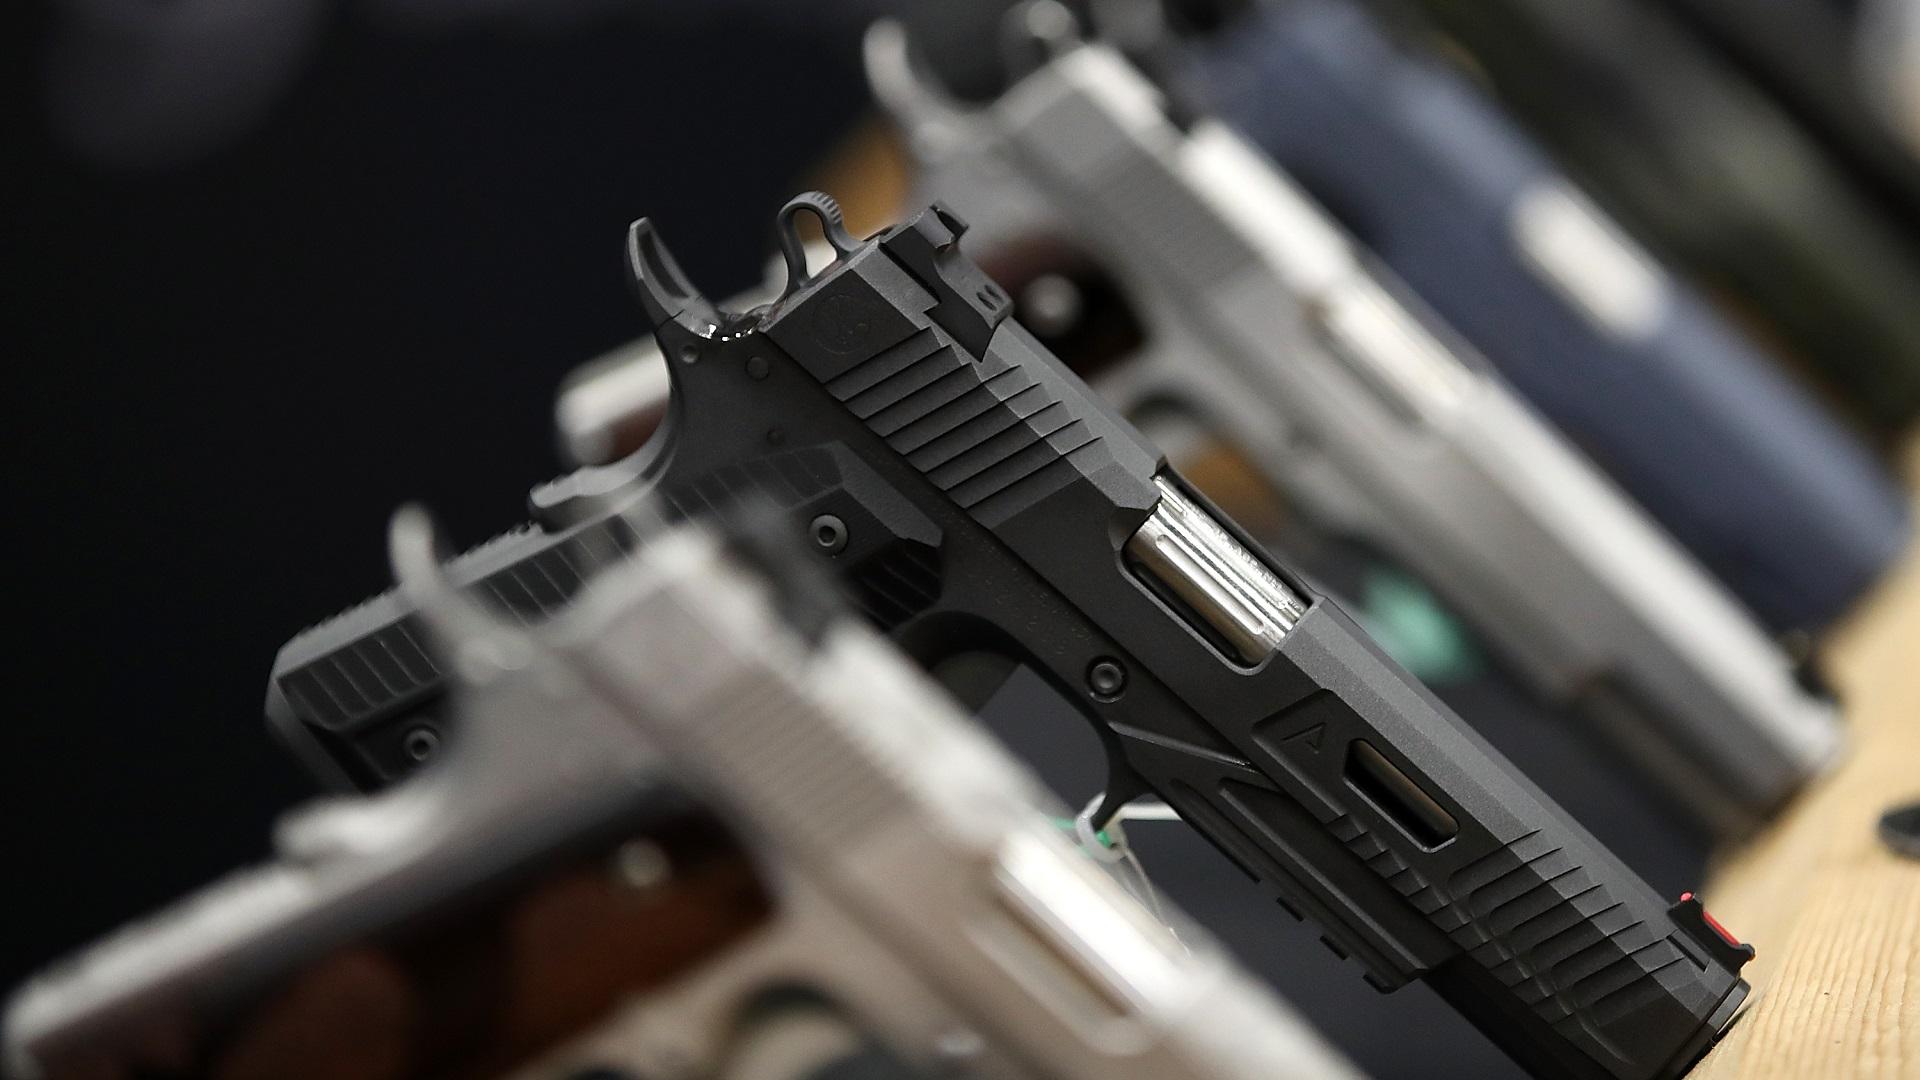 HANDGUNS GUN GENERIC